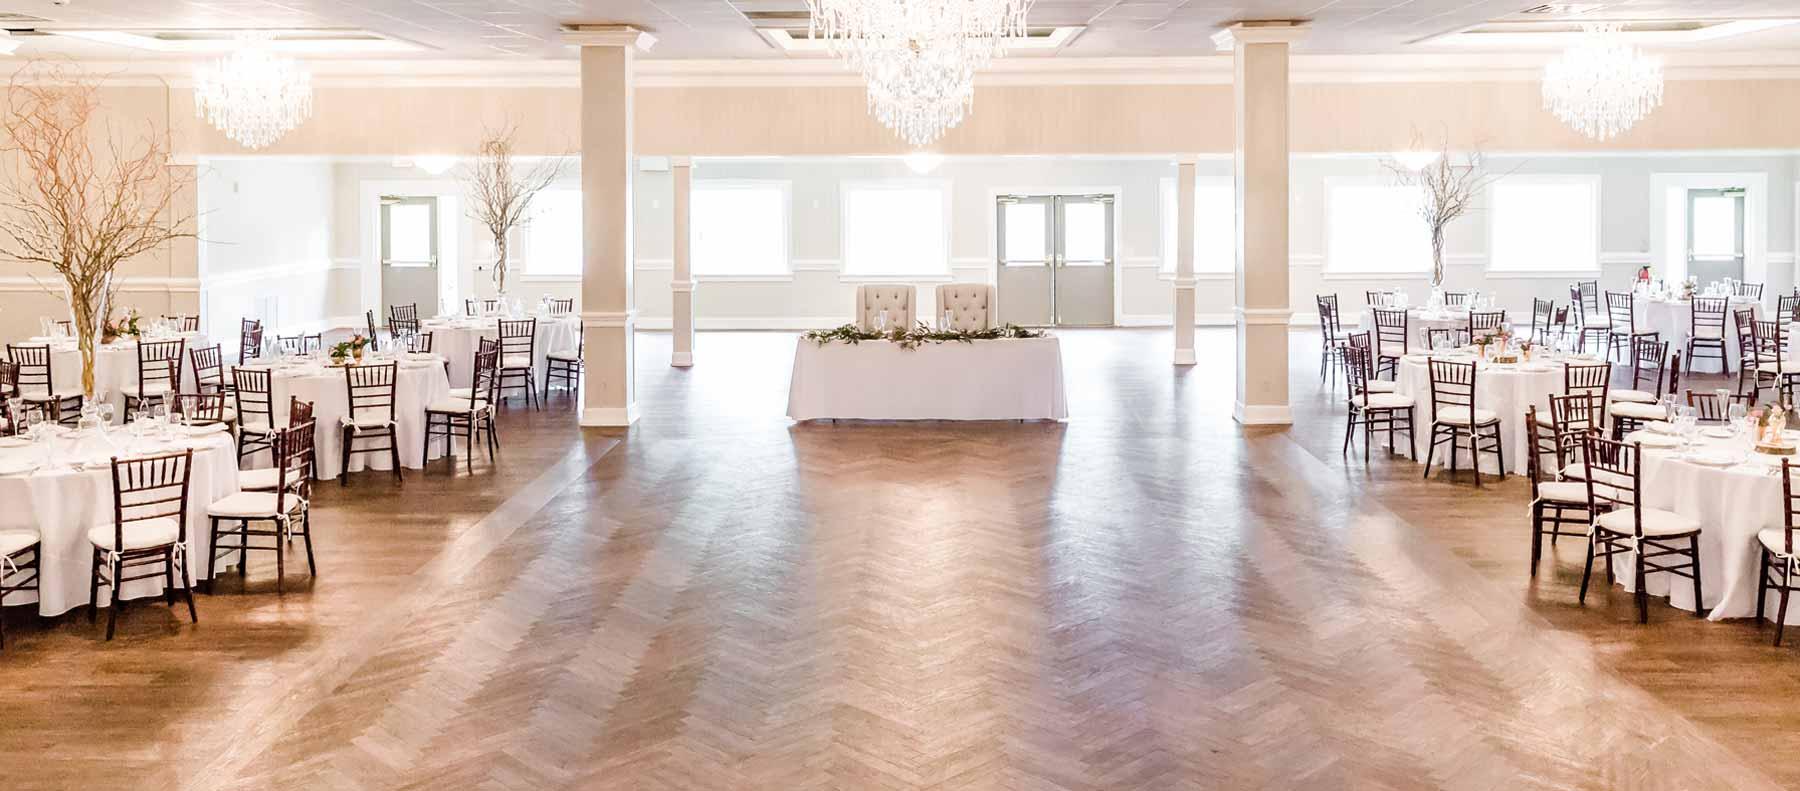 The Grove At Centerton Private Event Space NJ Wedding